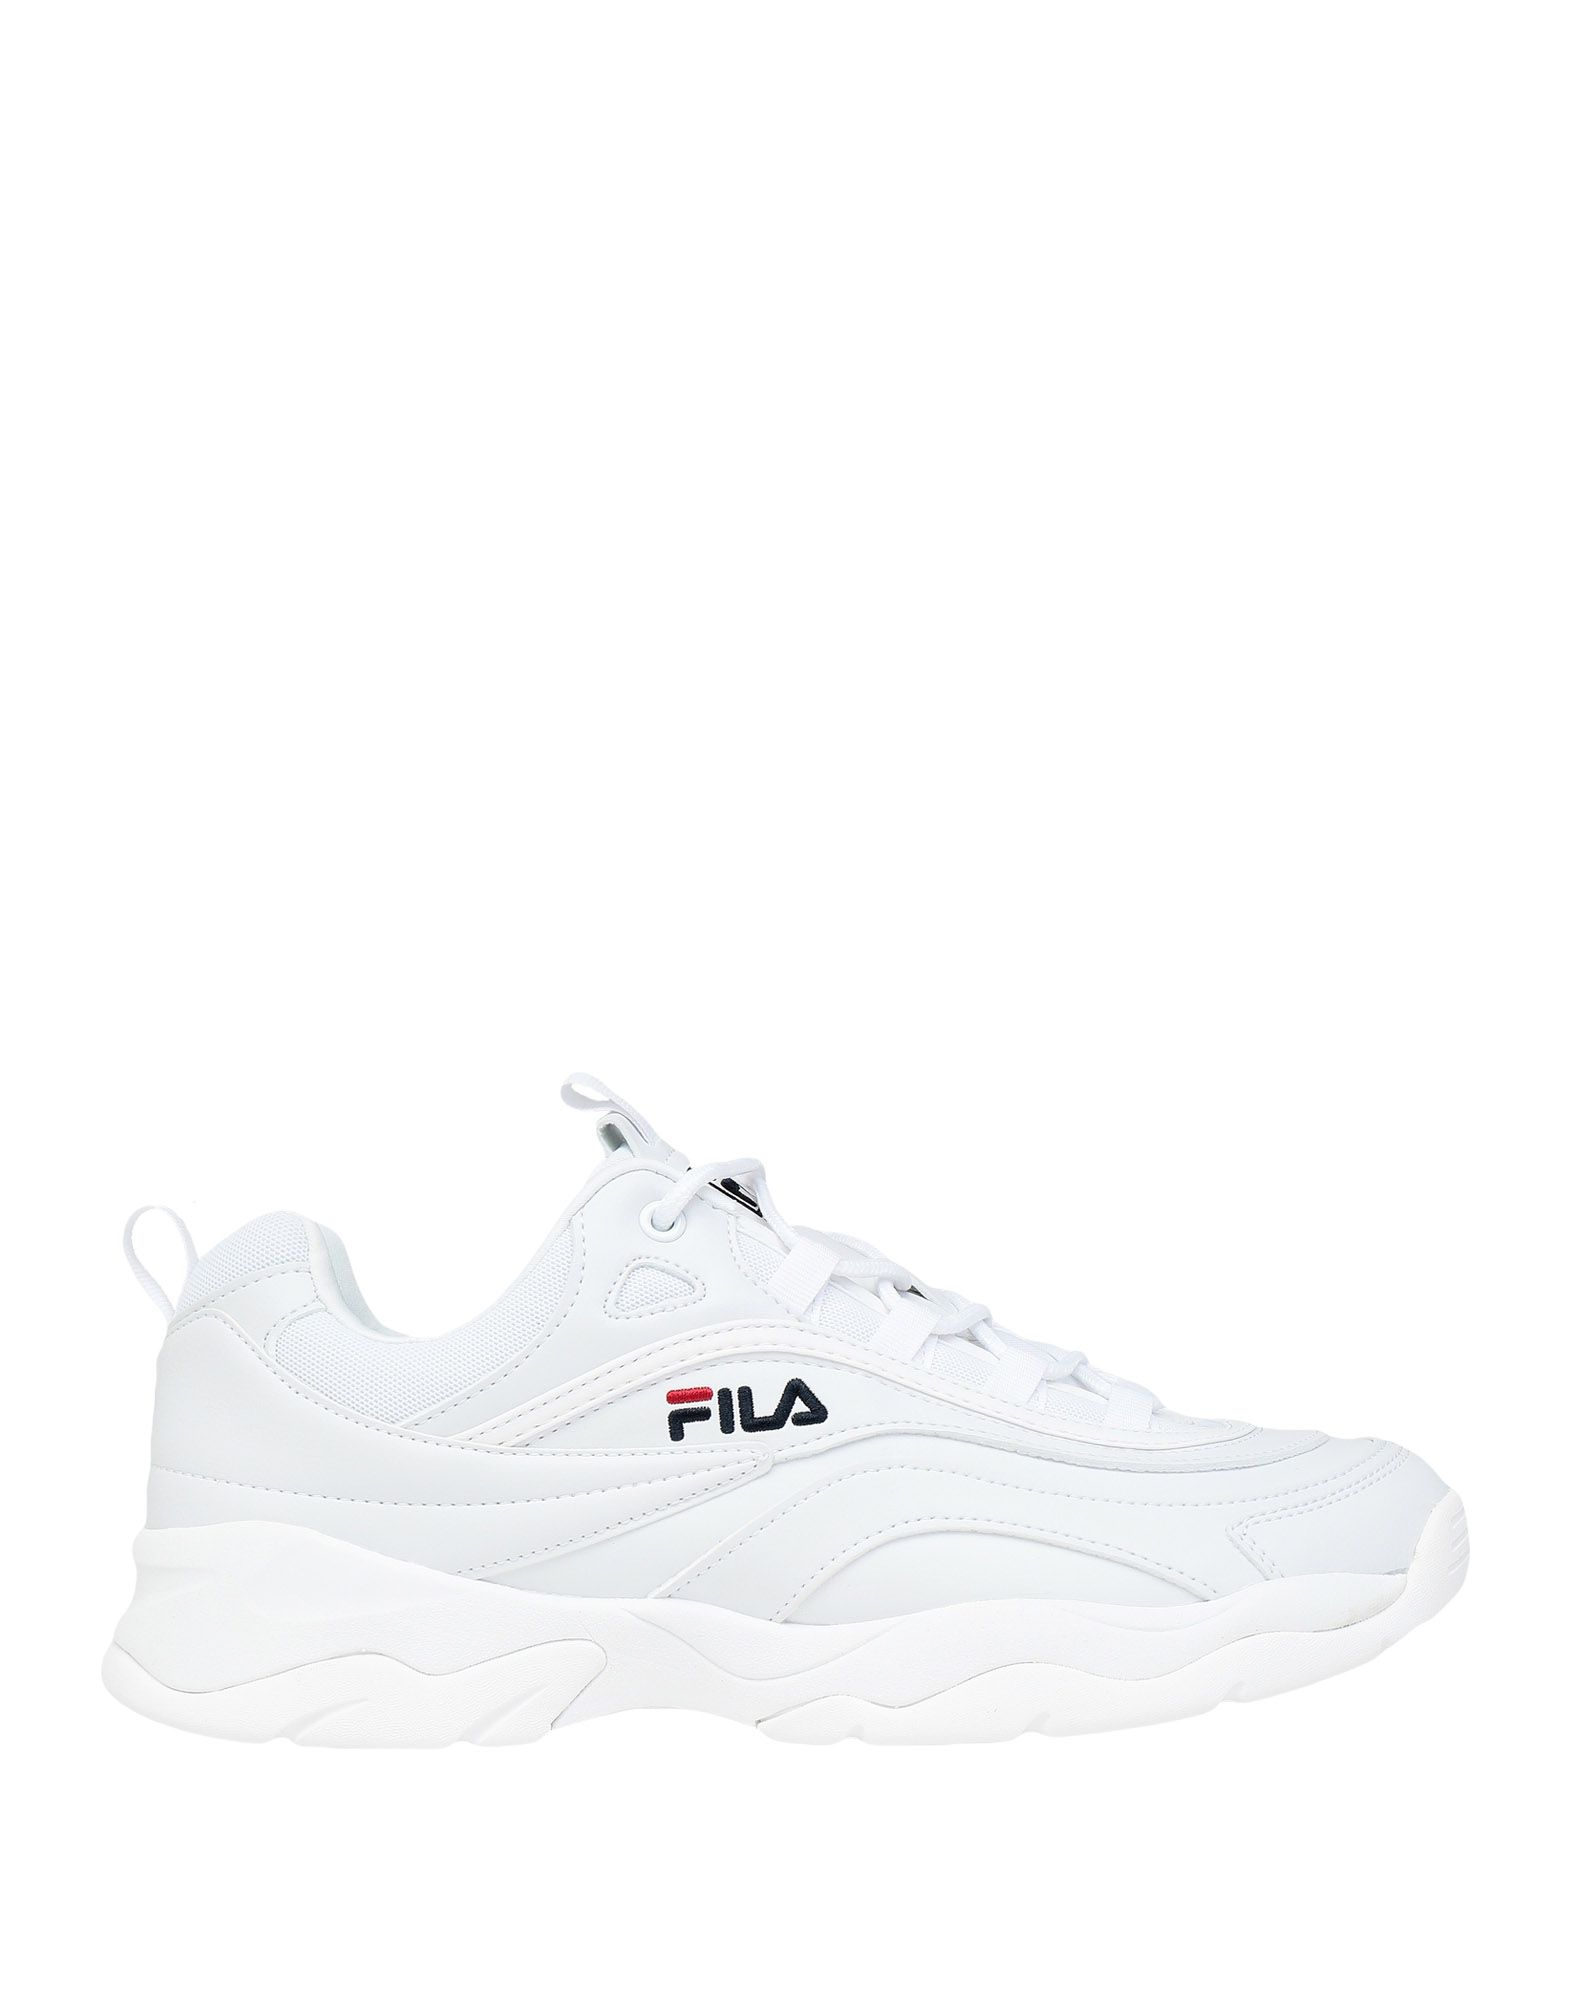 FILA Sneakers - Footwear | YOOX.COM